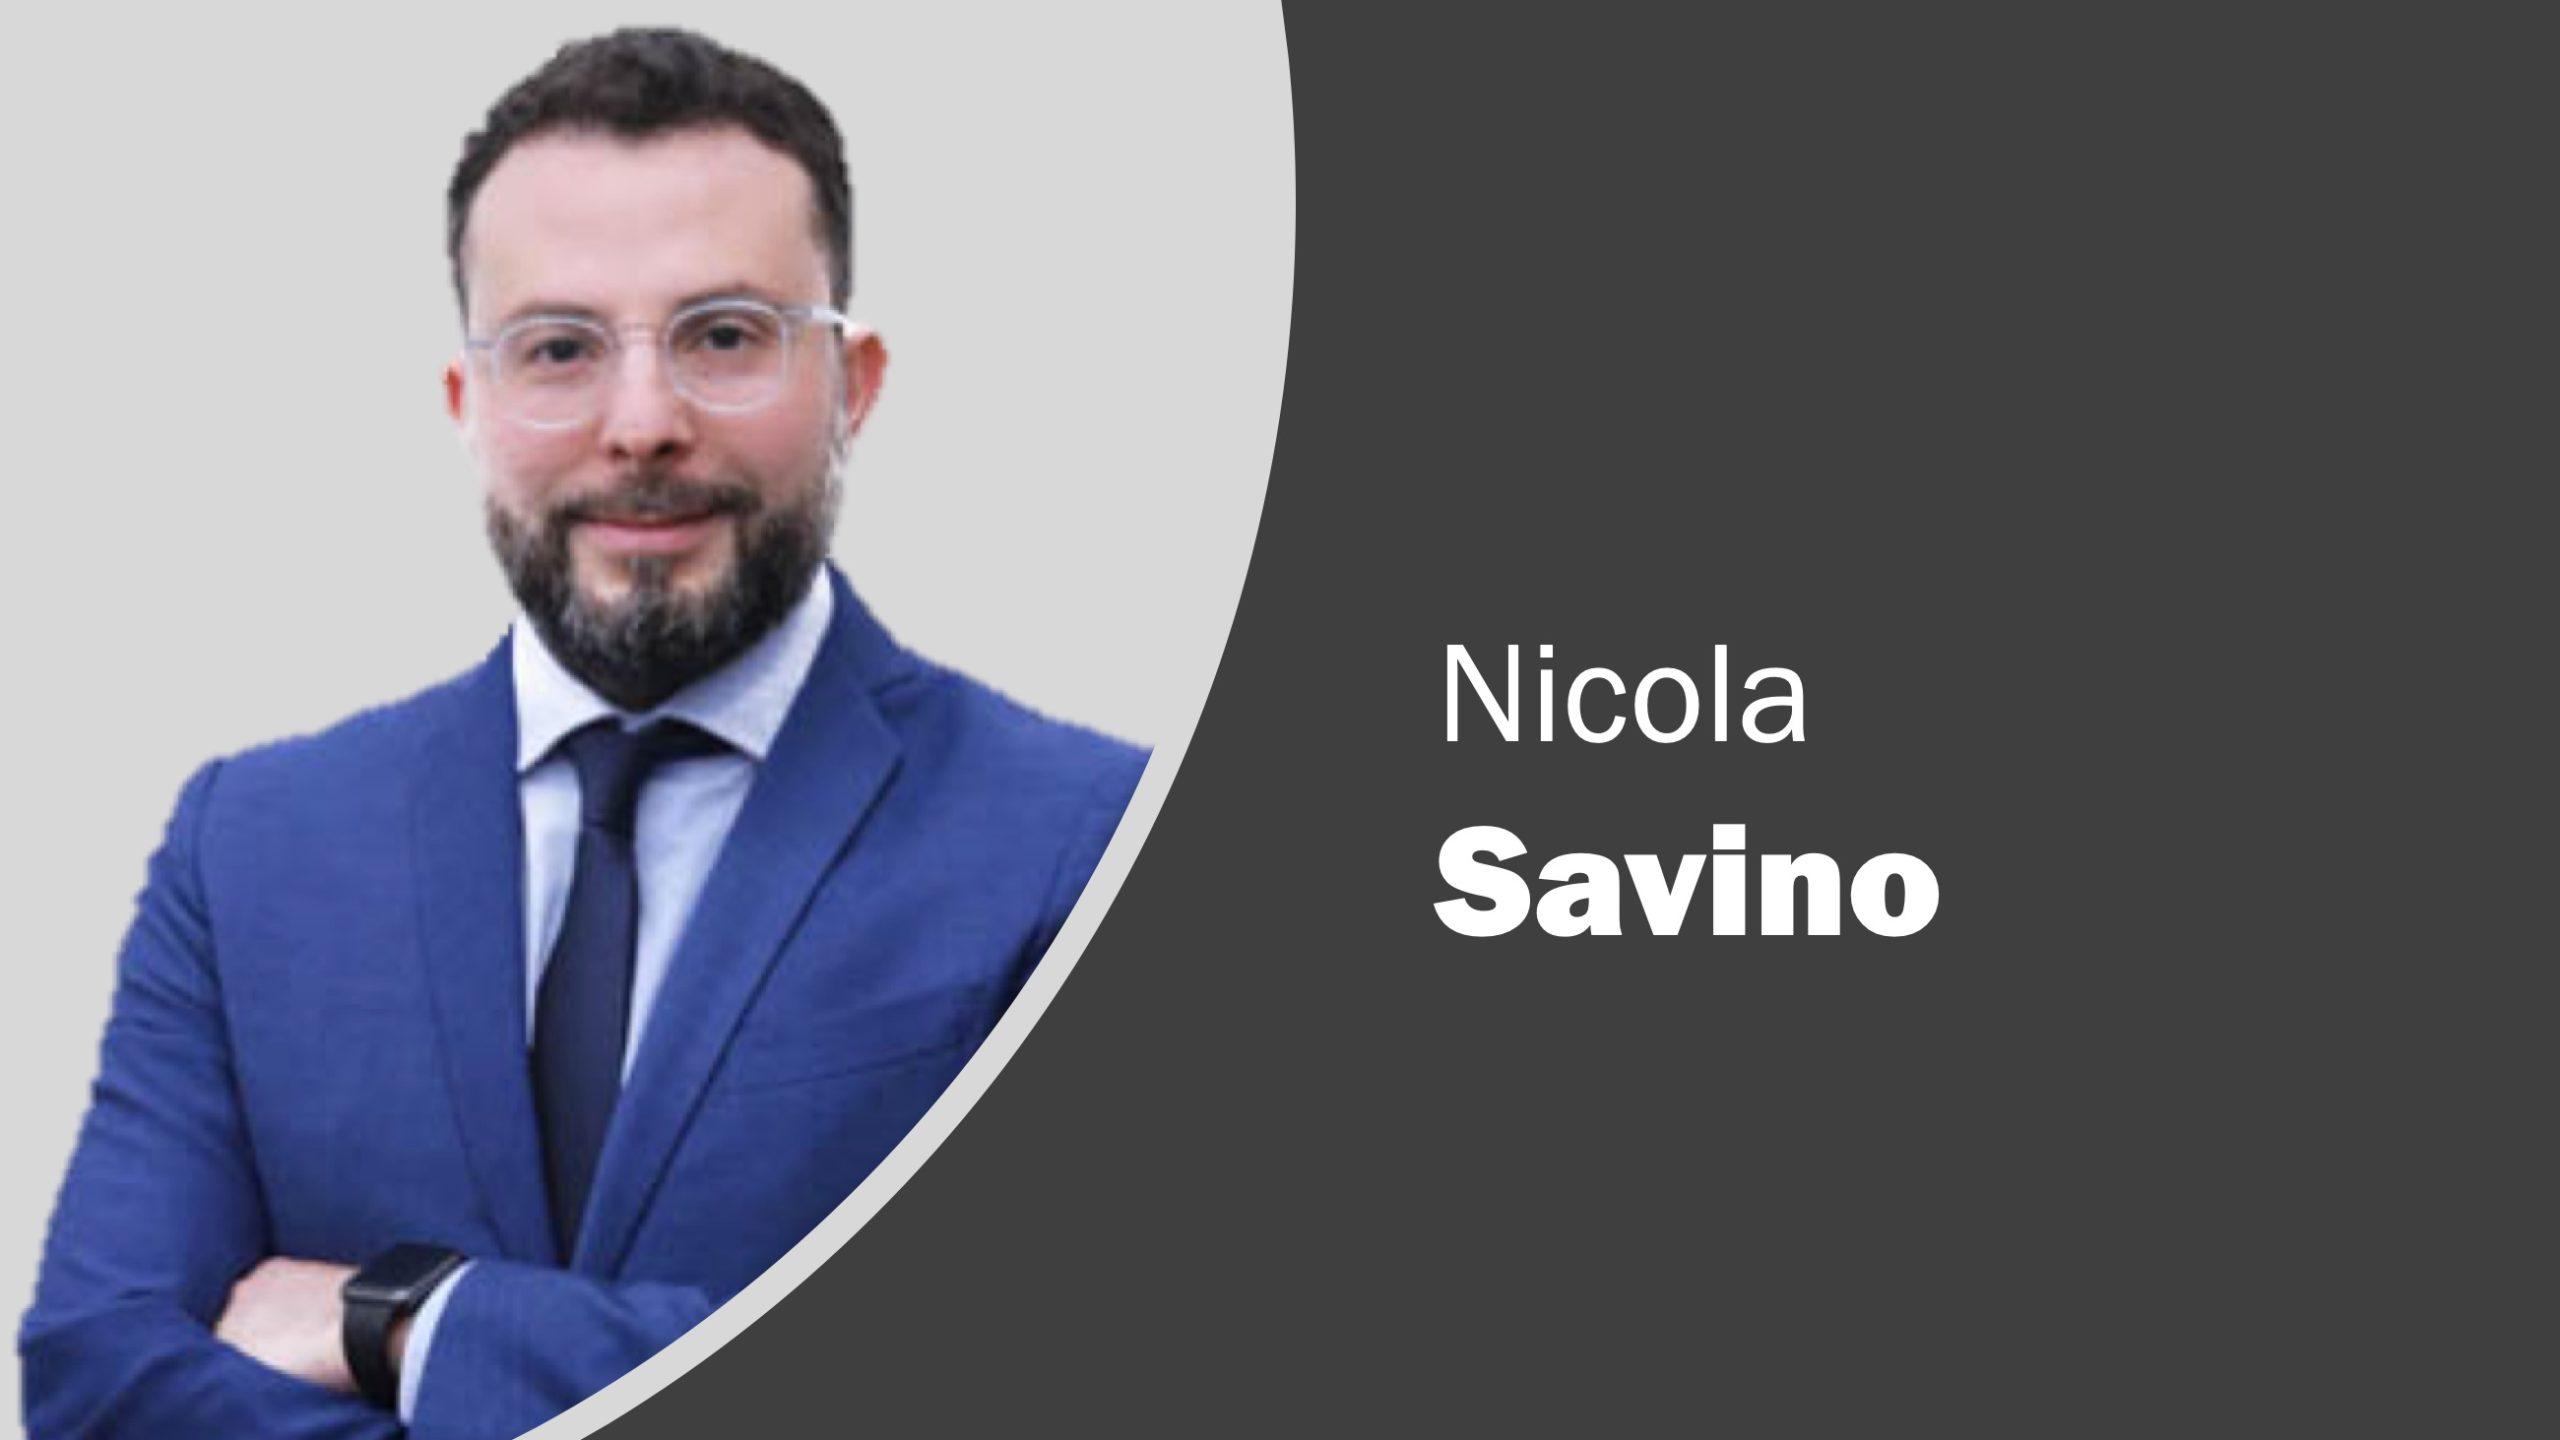 nicola_savino-scaled.jpg